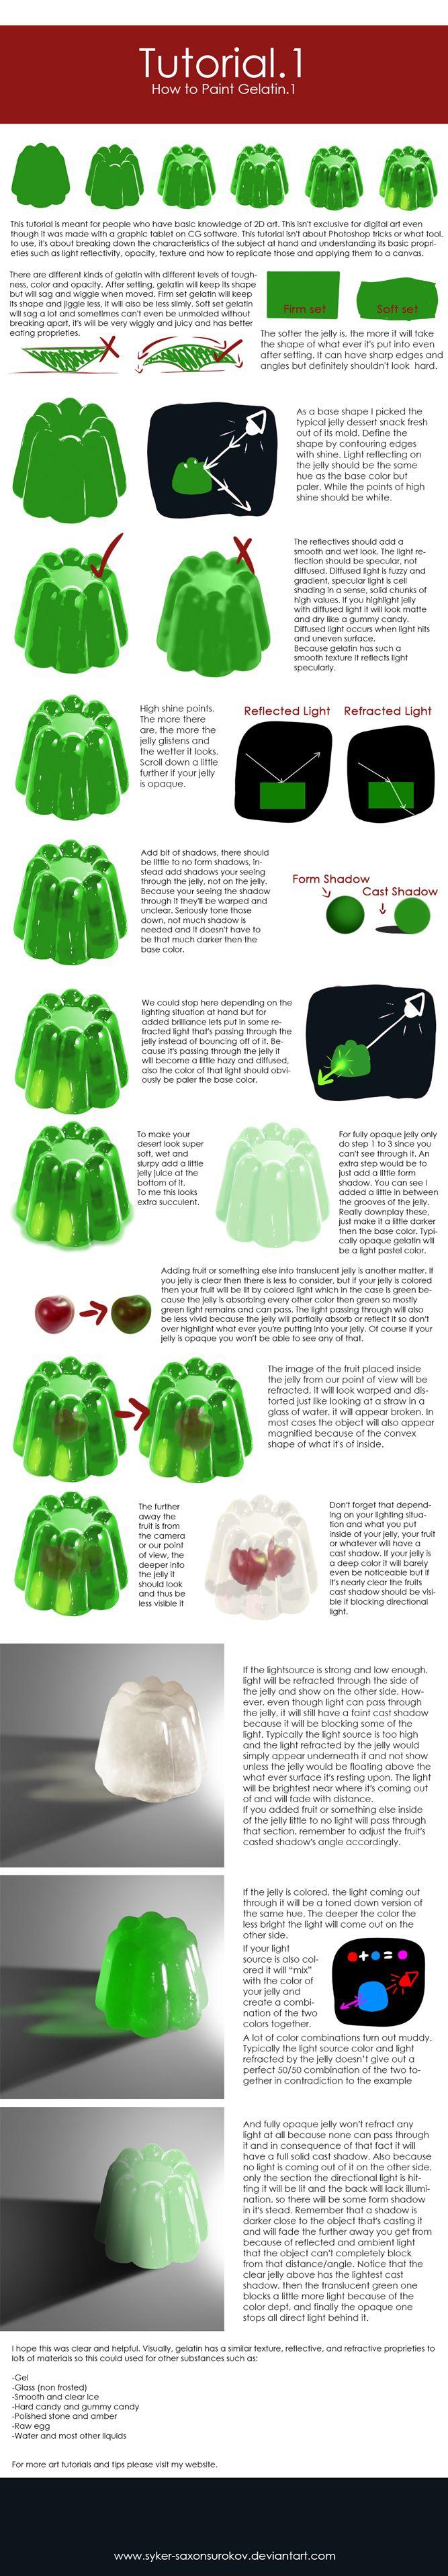 Tutorial.1 [How to Paint Gelatin.1] by Syker-SaxonSurokov on DeviantArt